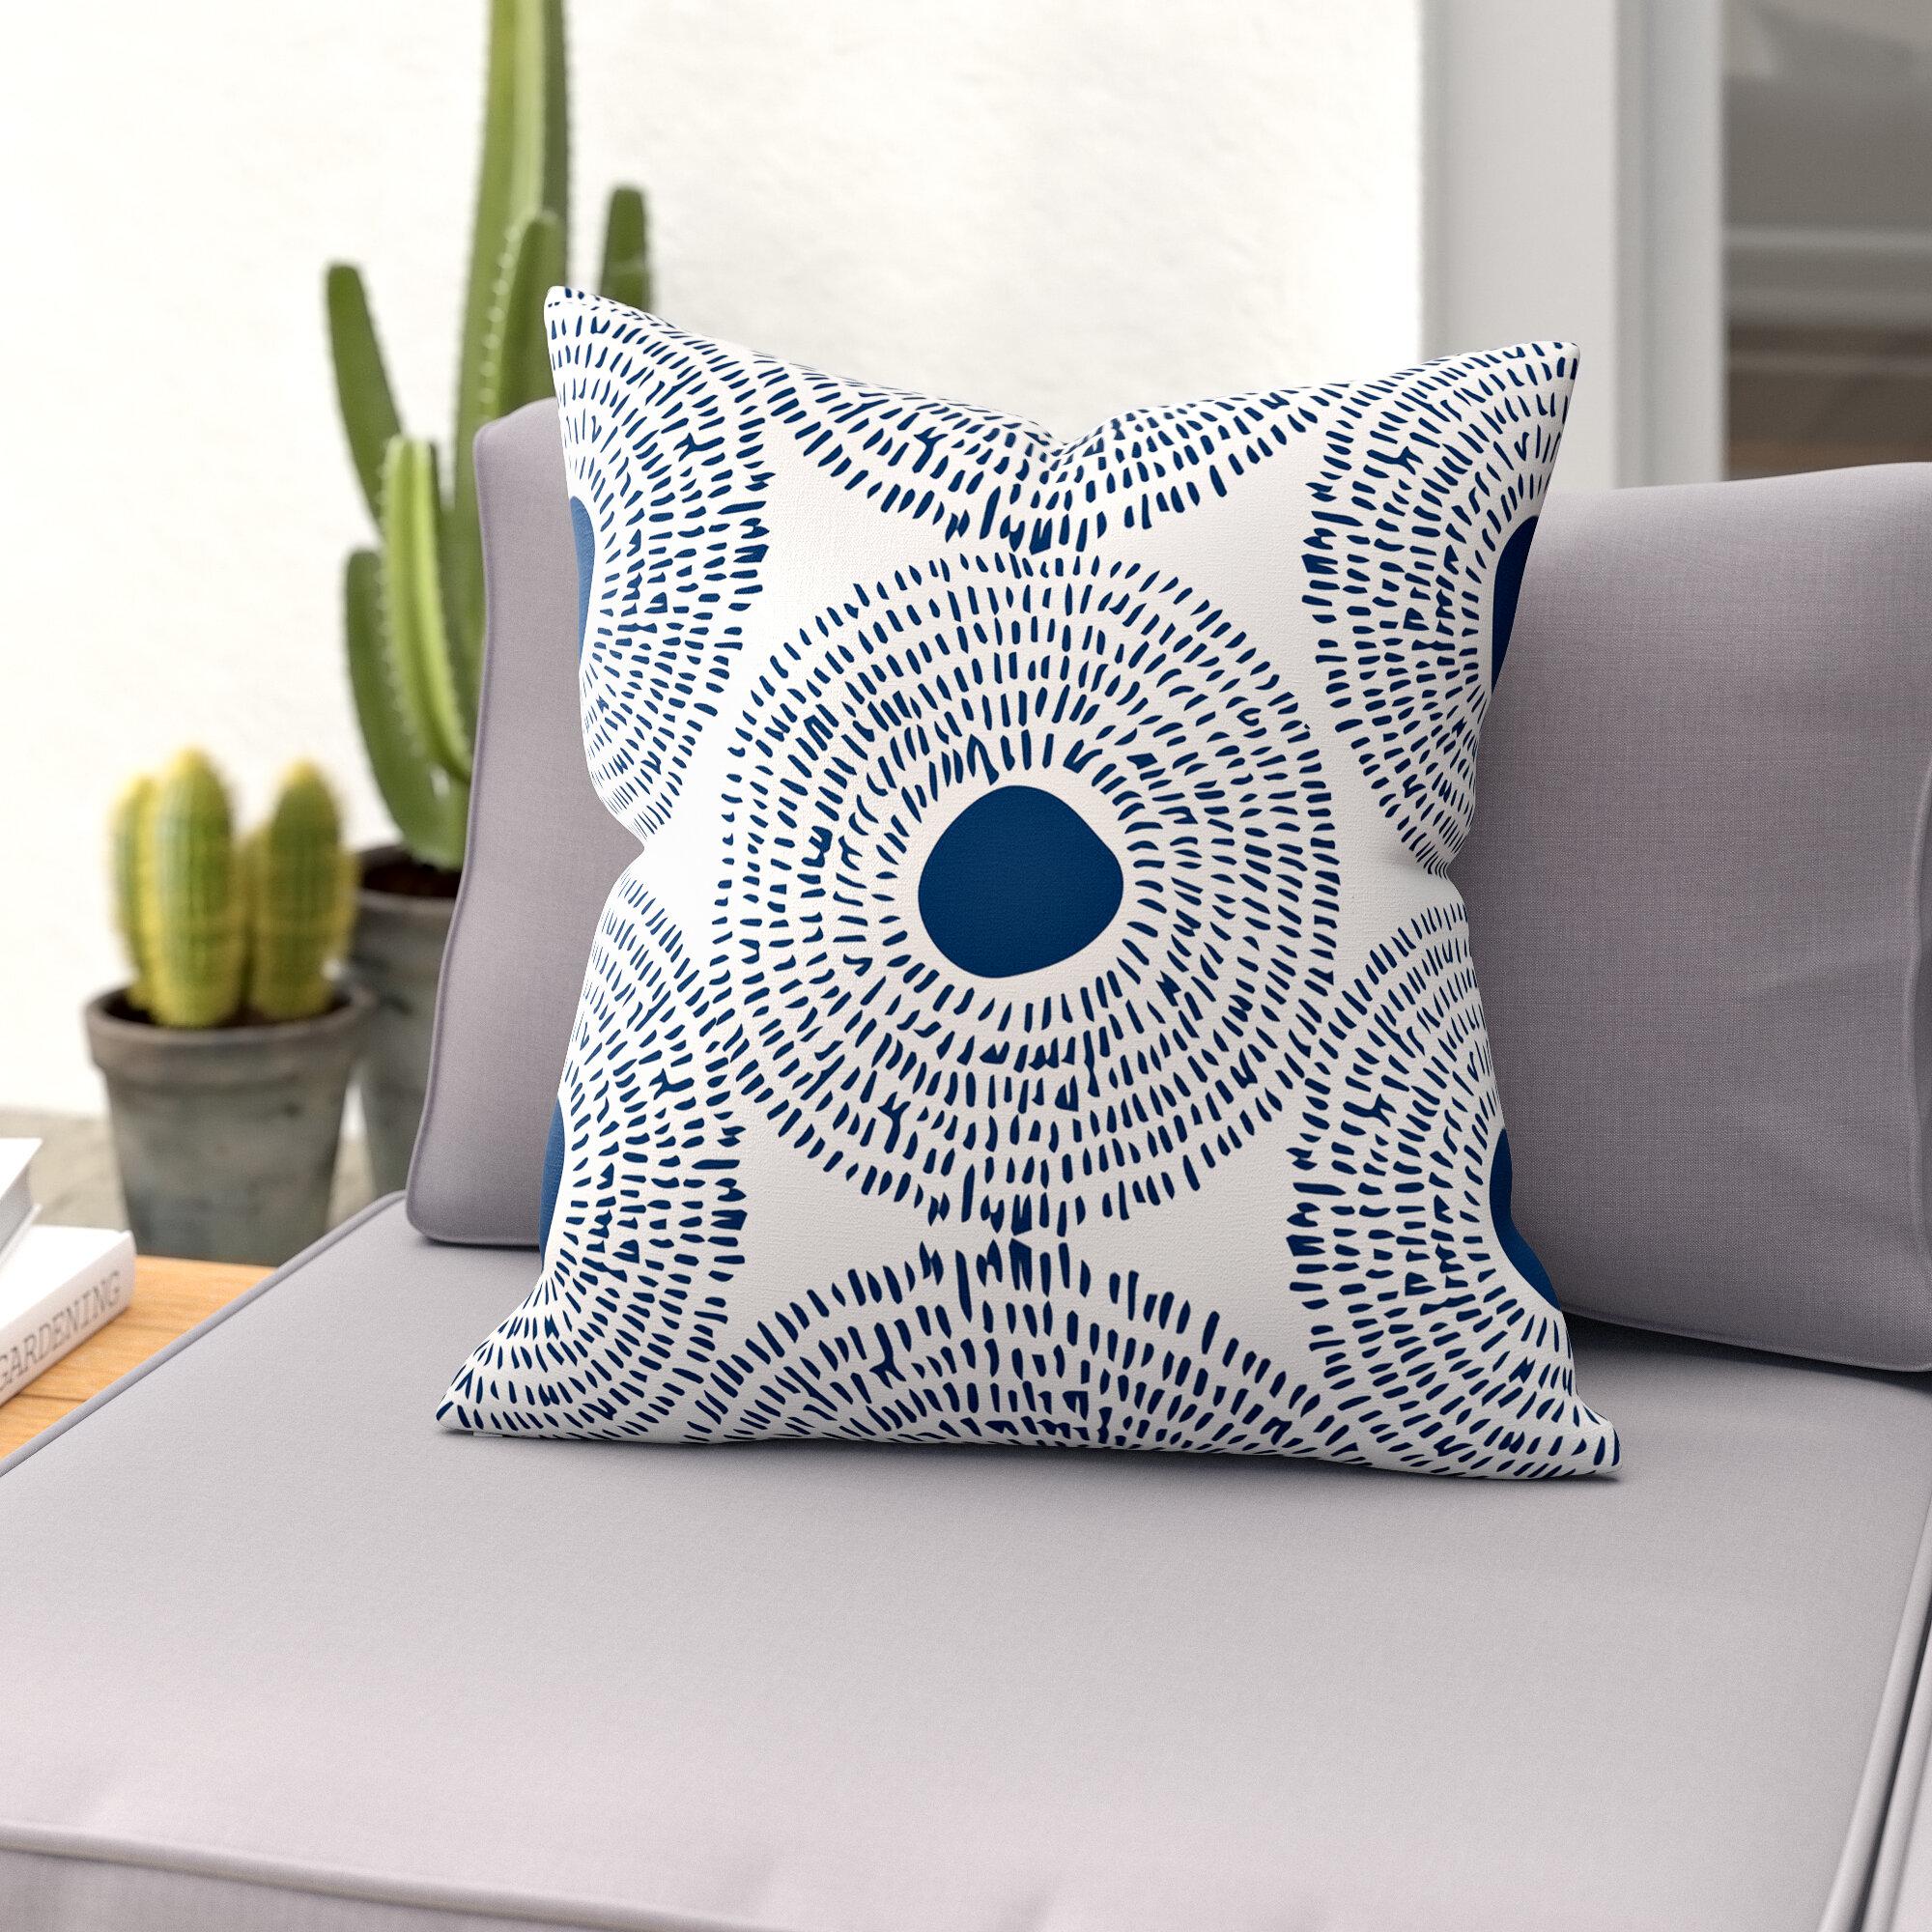 18 Square Throw Pillows You Ll Love In 2021 Wayfair